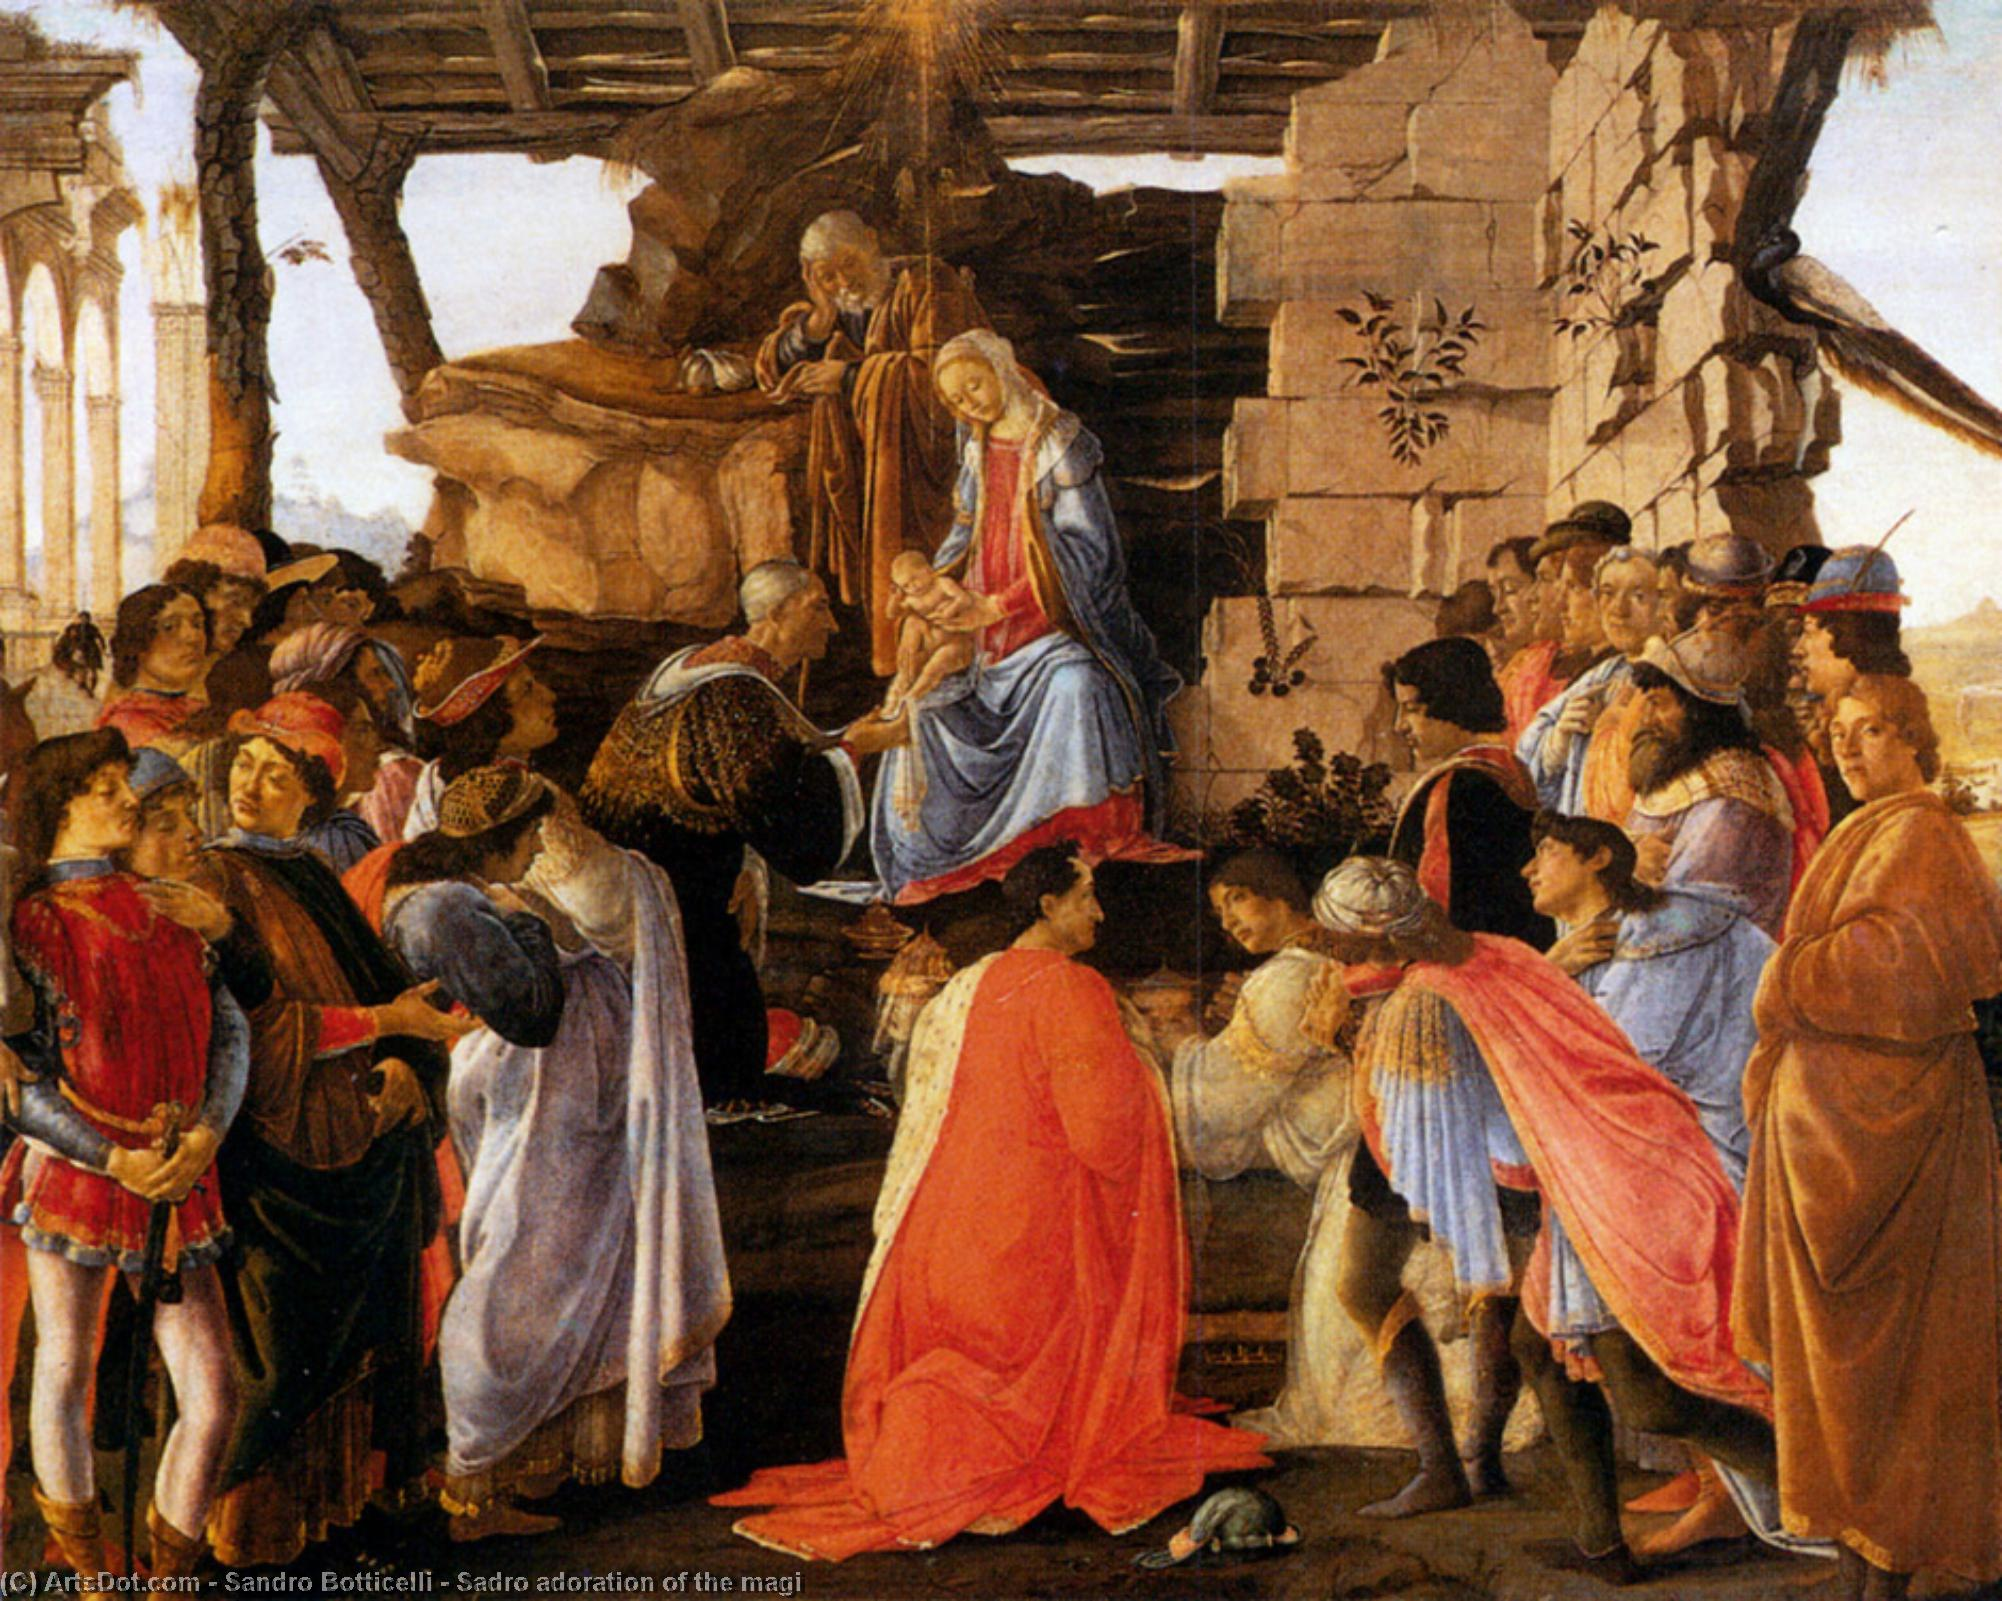 Wikioo.org - The Encyclopedia of Fine Arts - Painting, Artwork by Sandro Botticelli - Sadro adoration of the magi